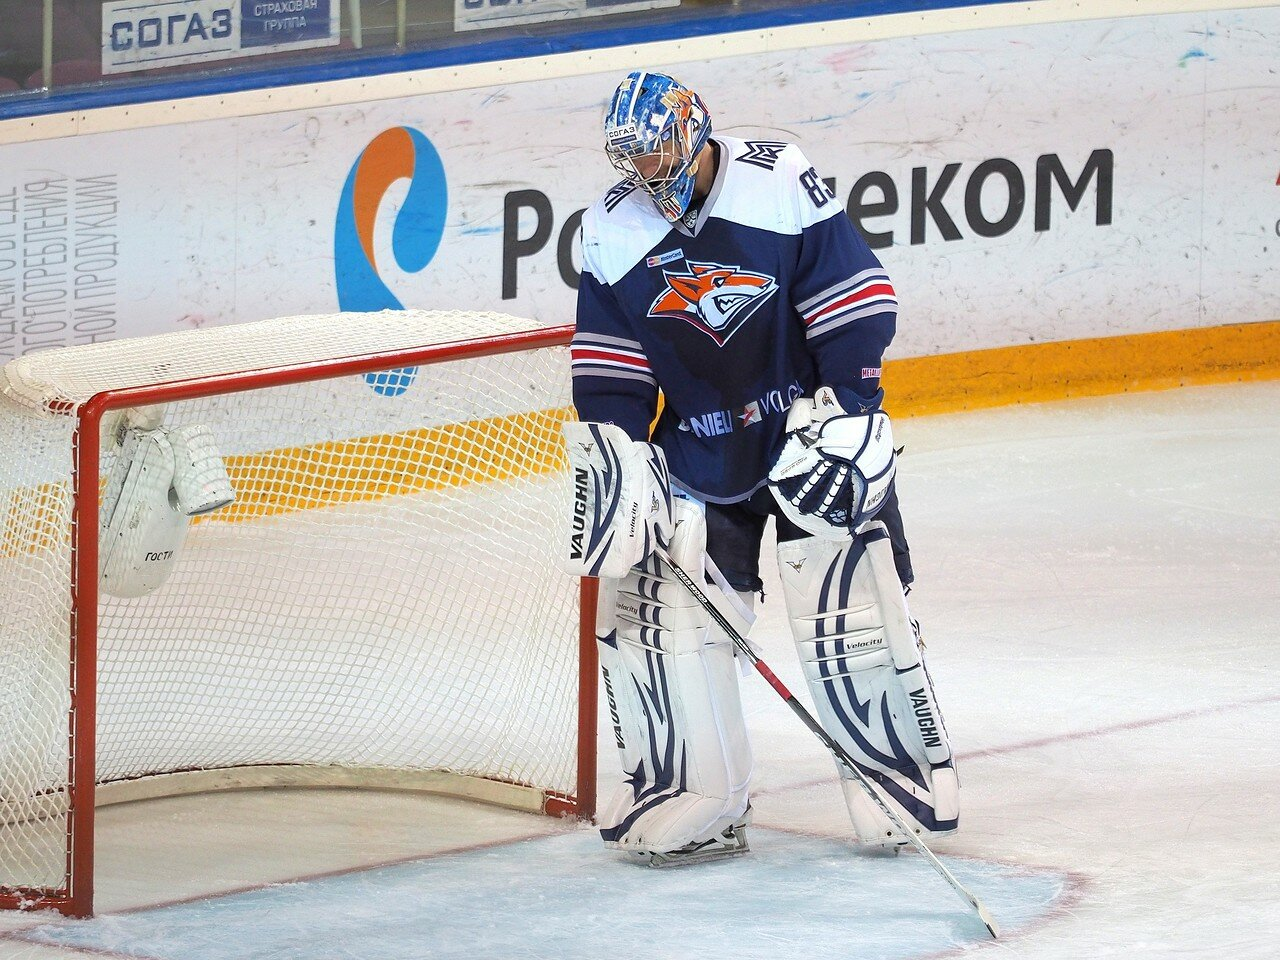 98Восток 1/2 плей-офф Металлург - Сибирь 08.03.2016